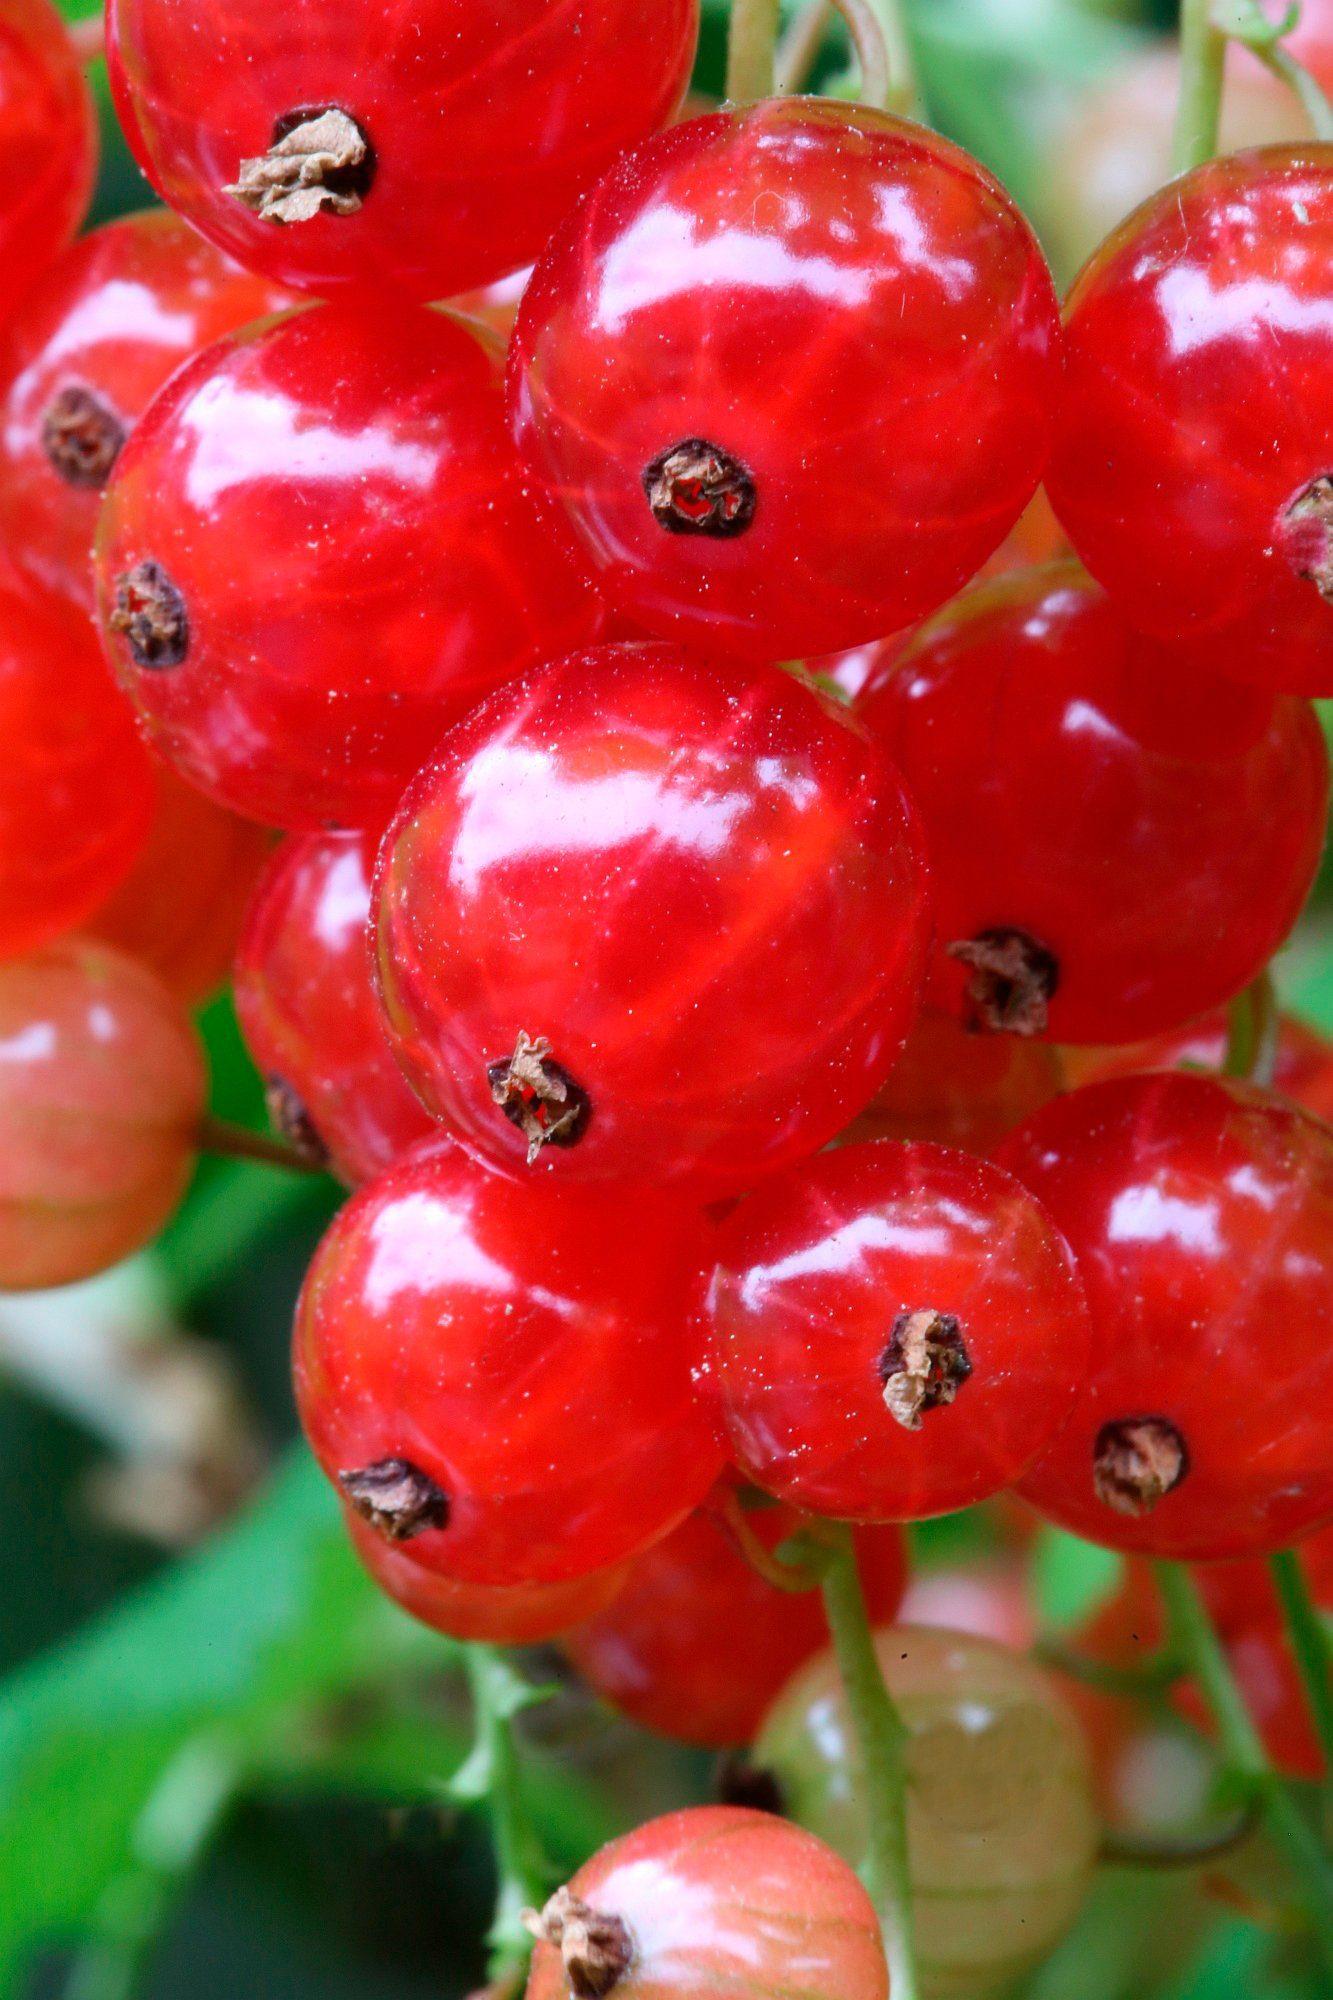 BCM Säulenobst »Rote Johannisbeere Red Poll«, Höhe: 50 cm, 2 Pflanzen